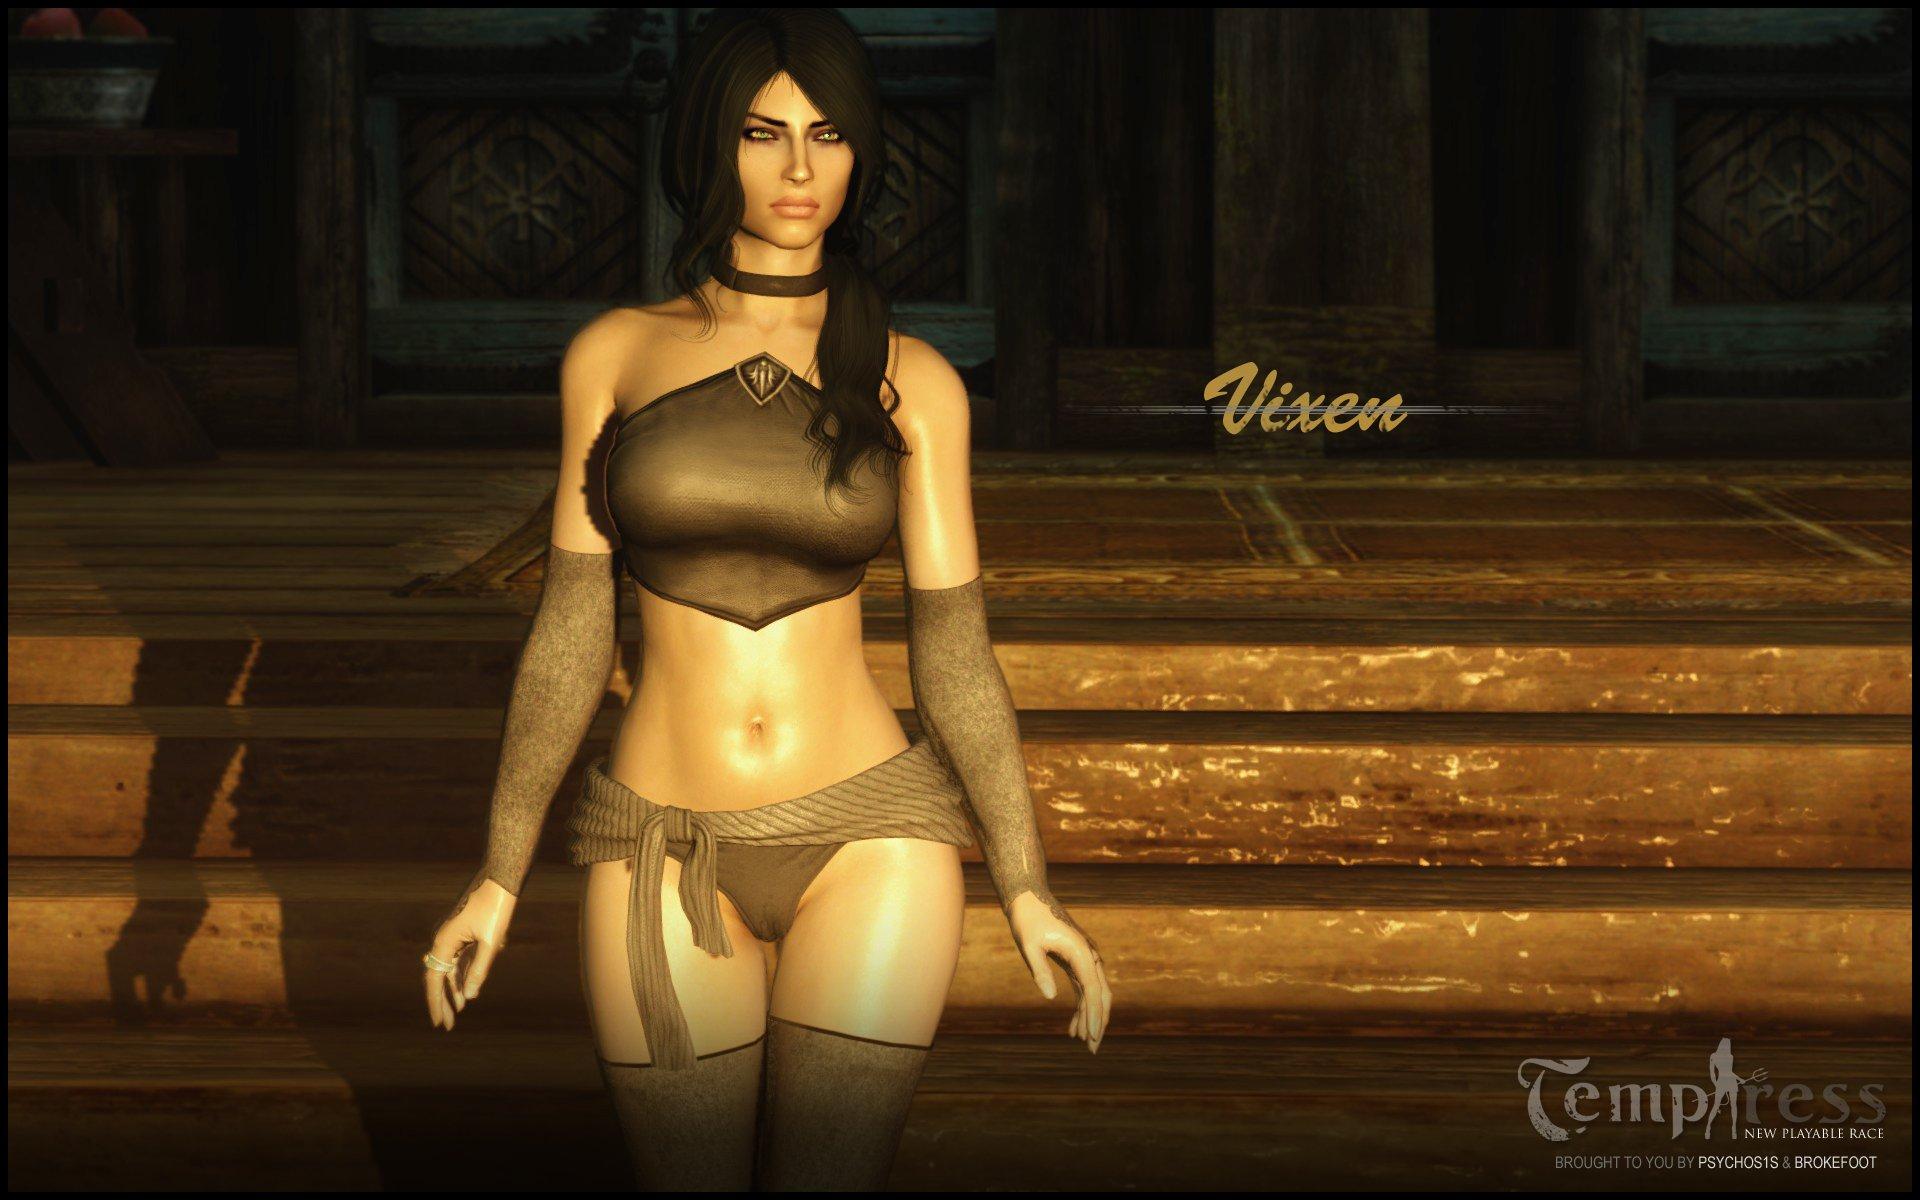 Temptress XXX Tube Porn Movies 1-15 of 15 Temptress Sex